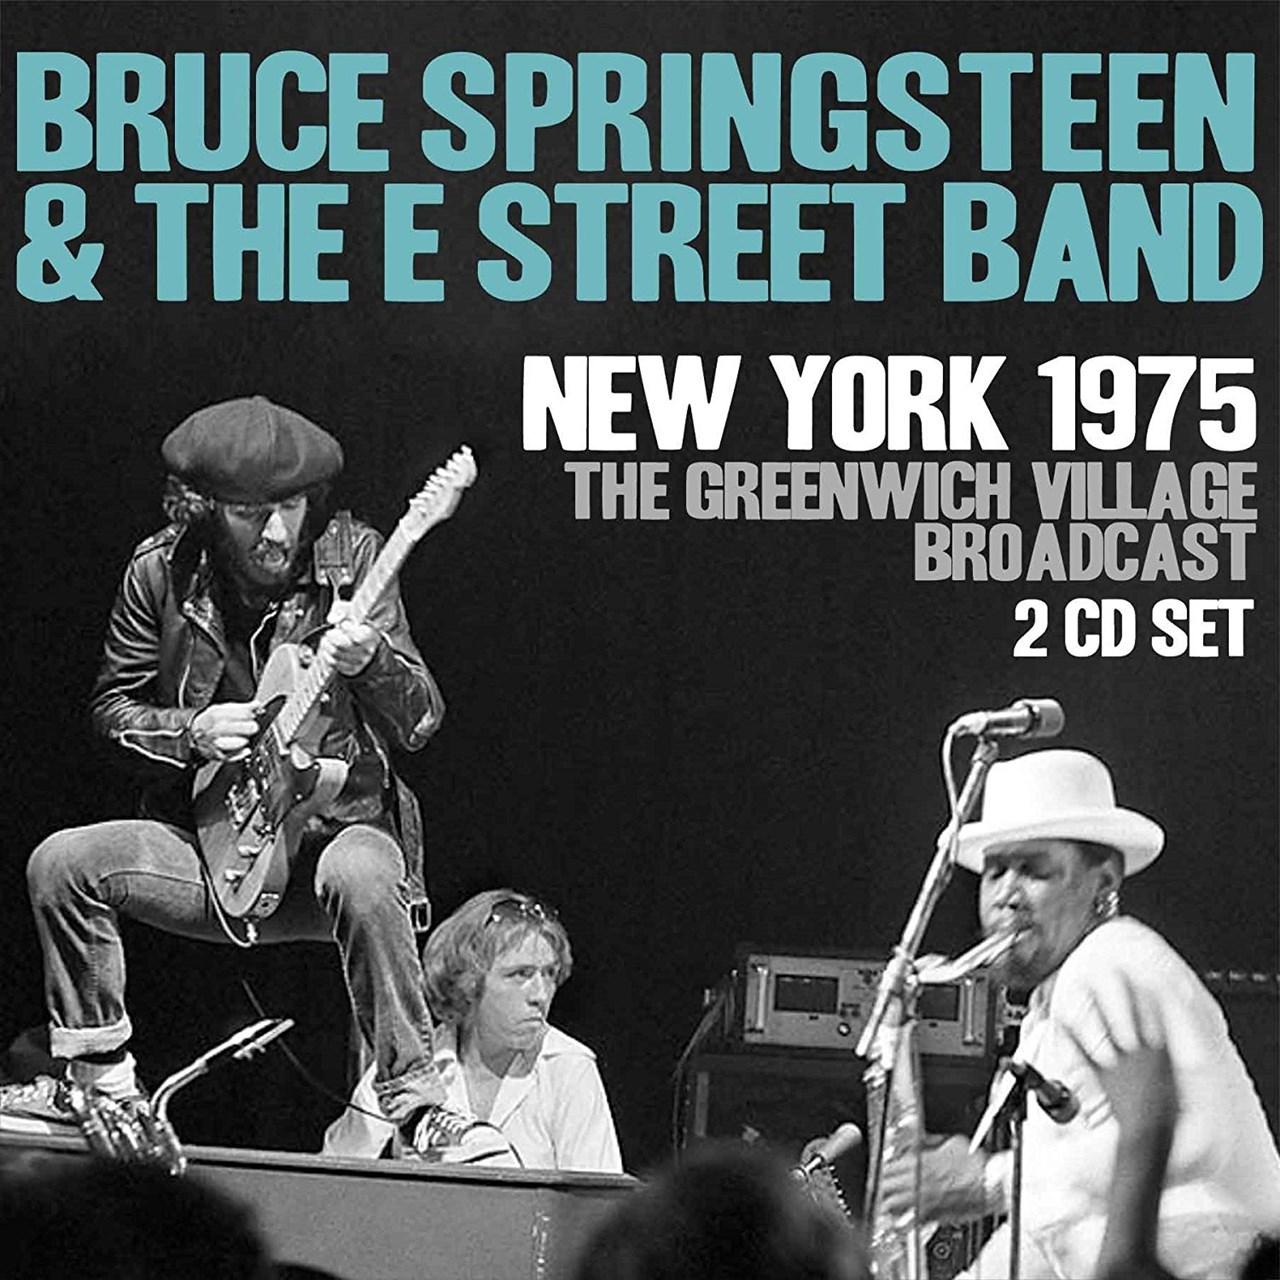 New York 1975 - 1